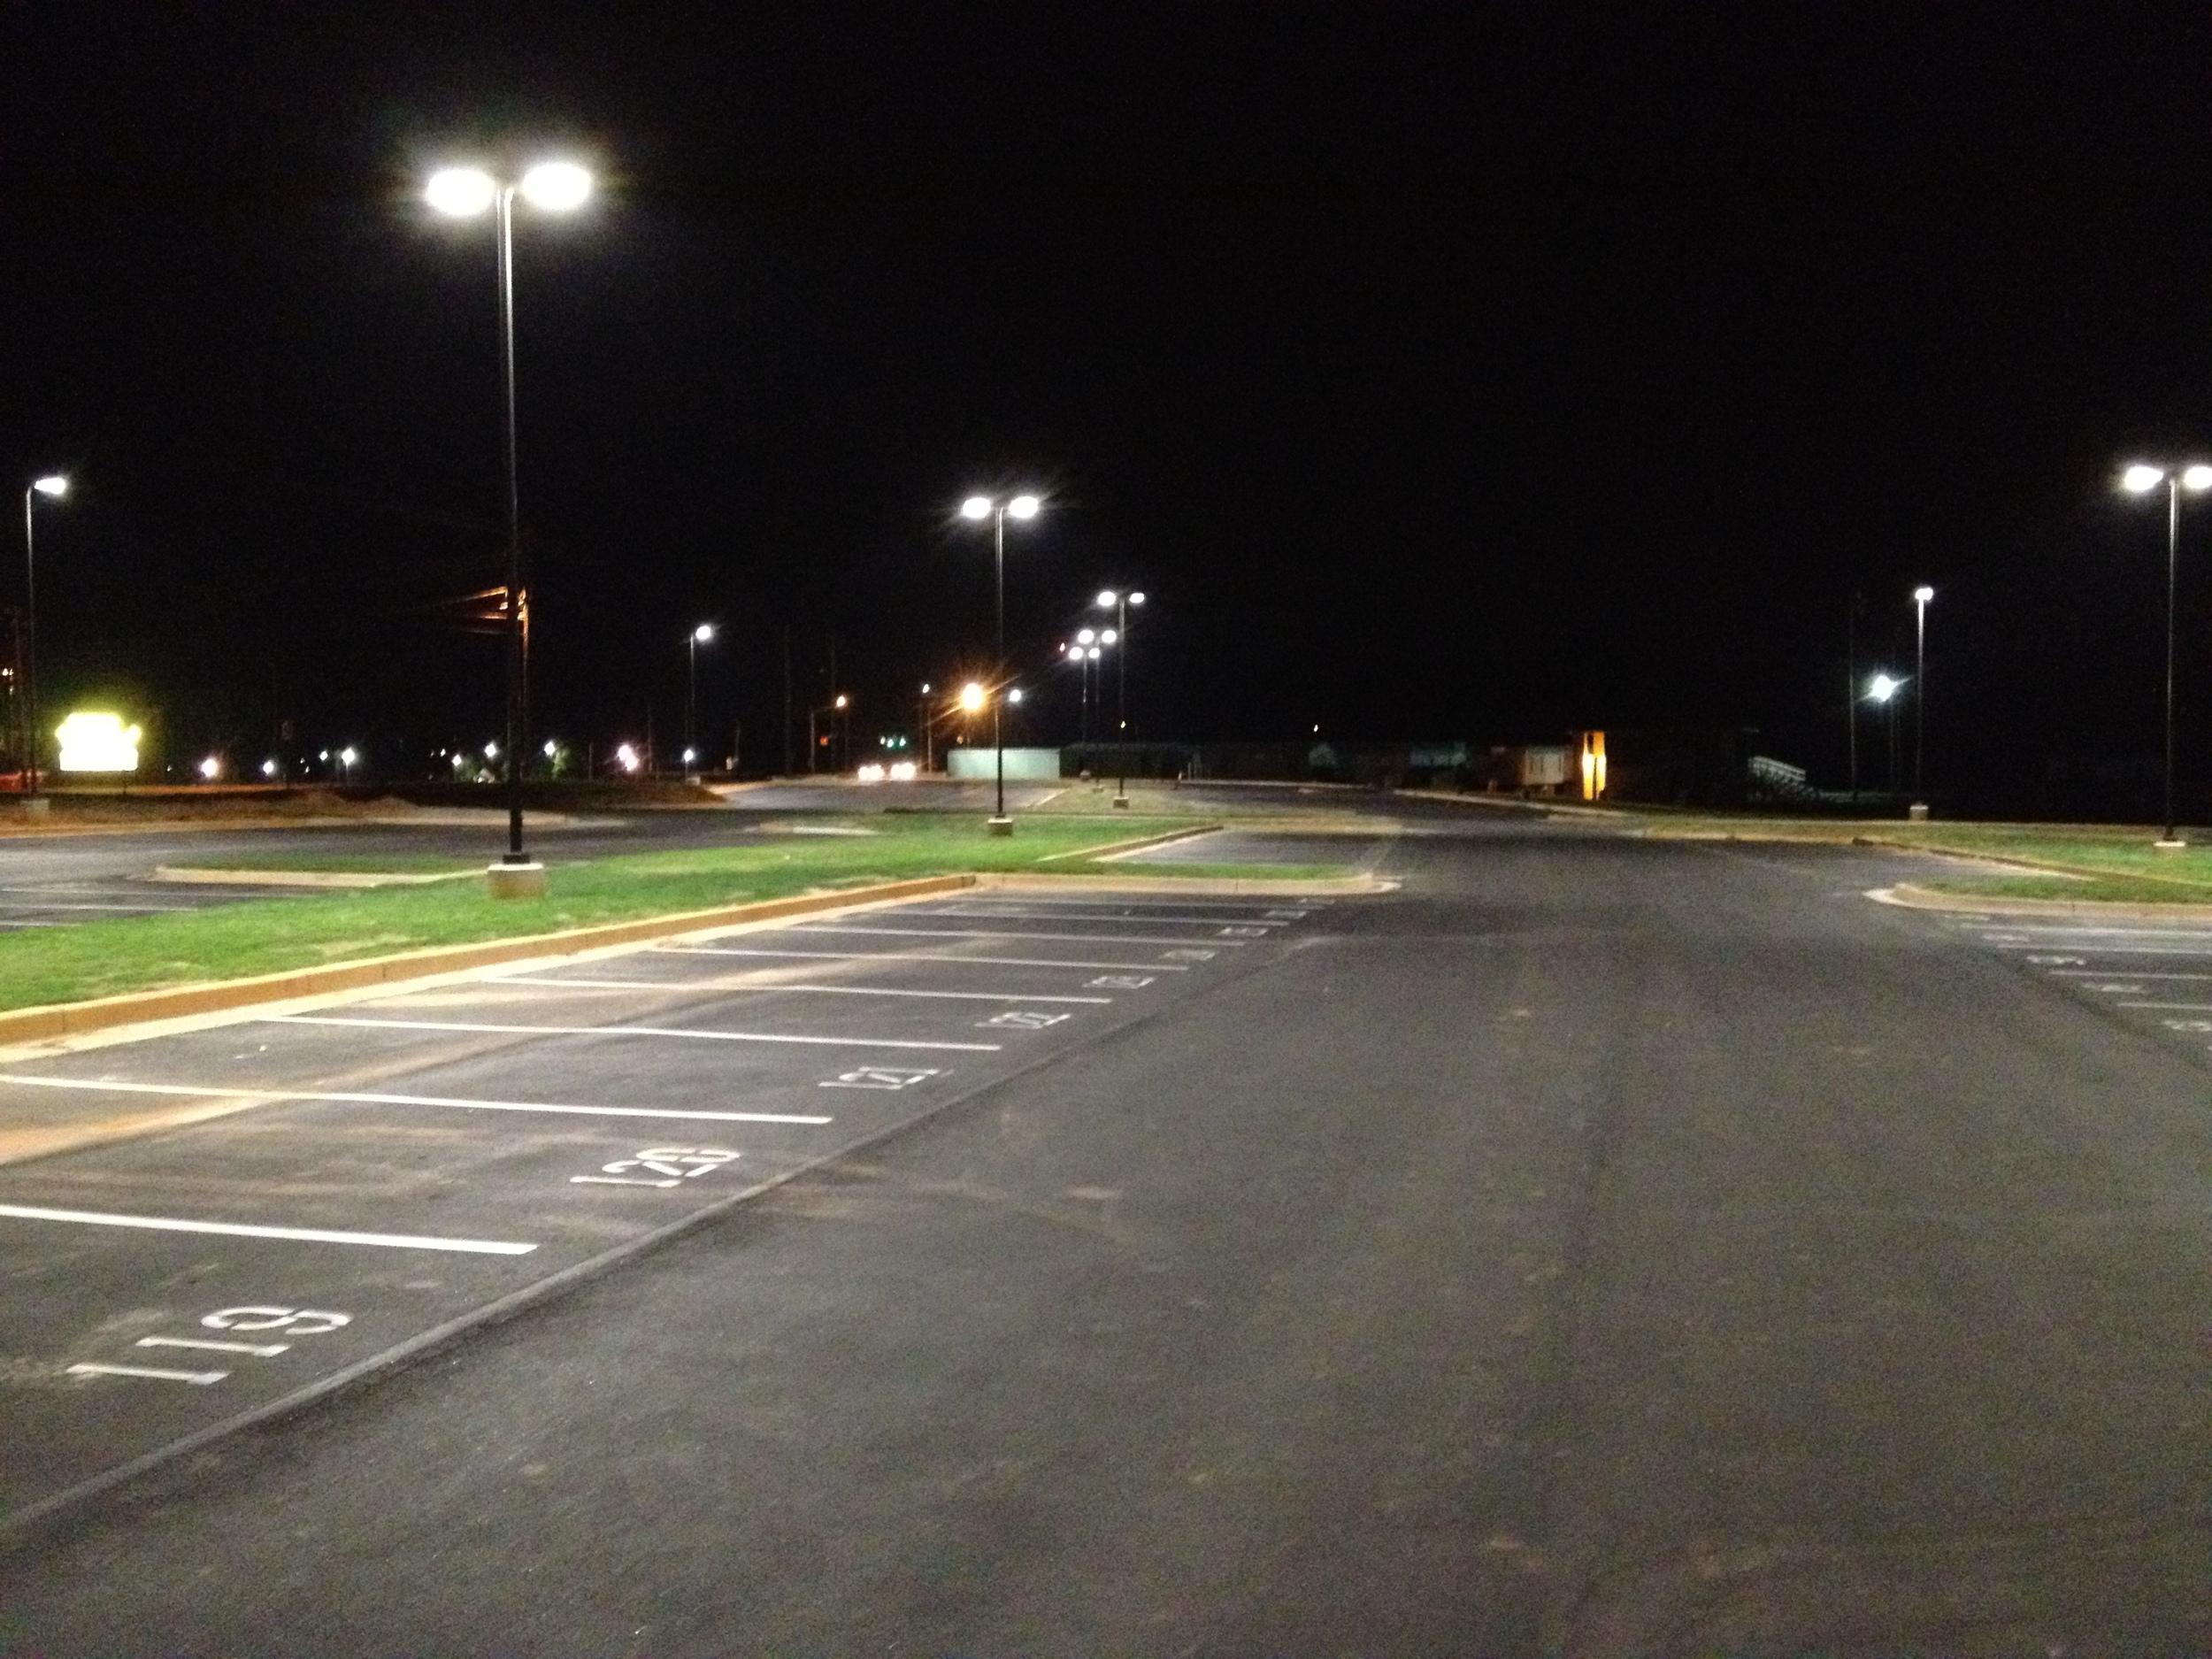 LED Lit Parking Lot